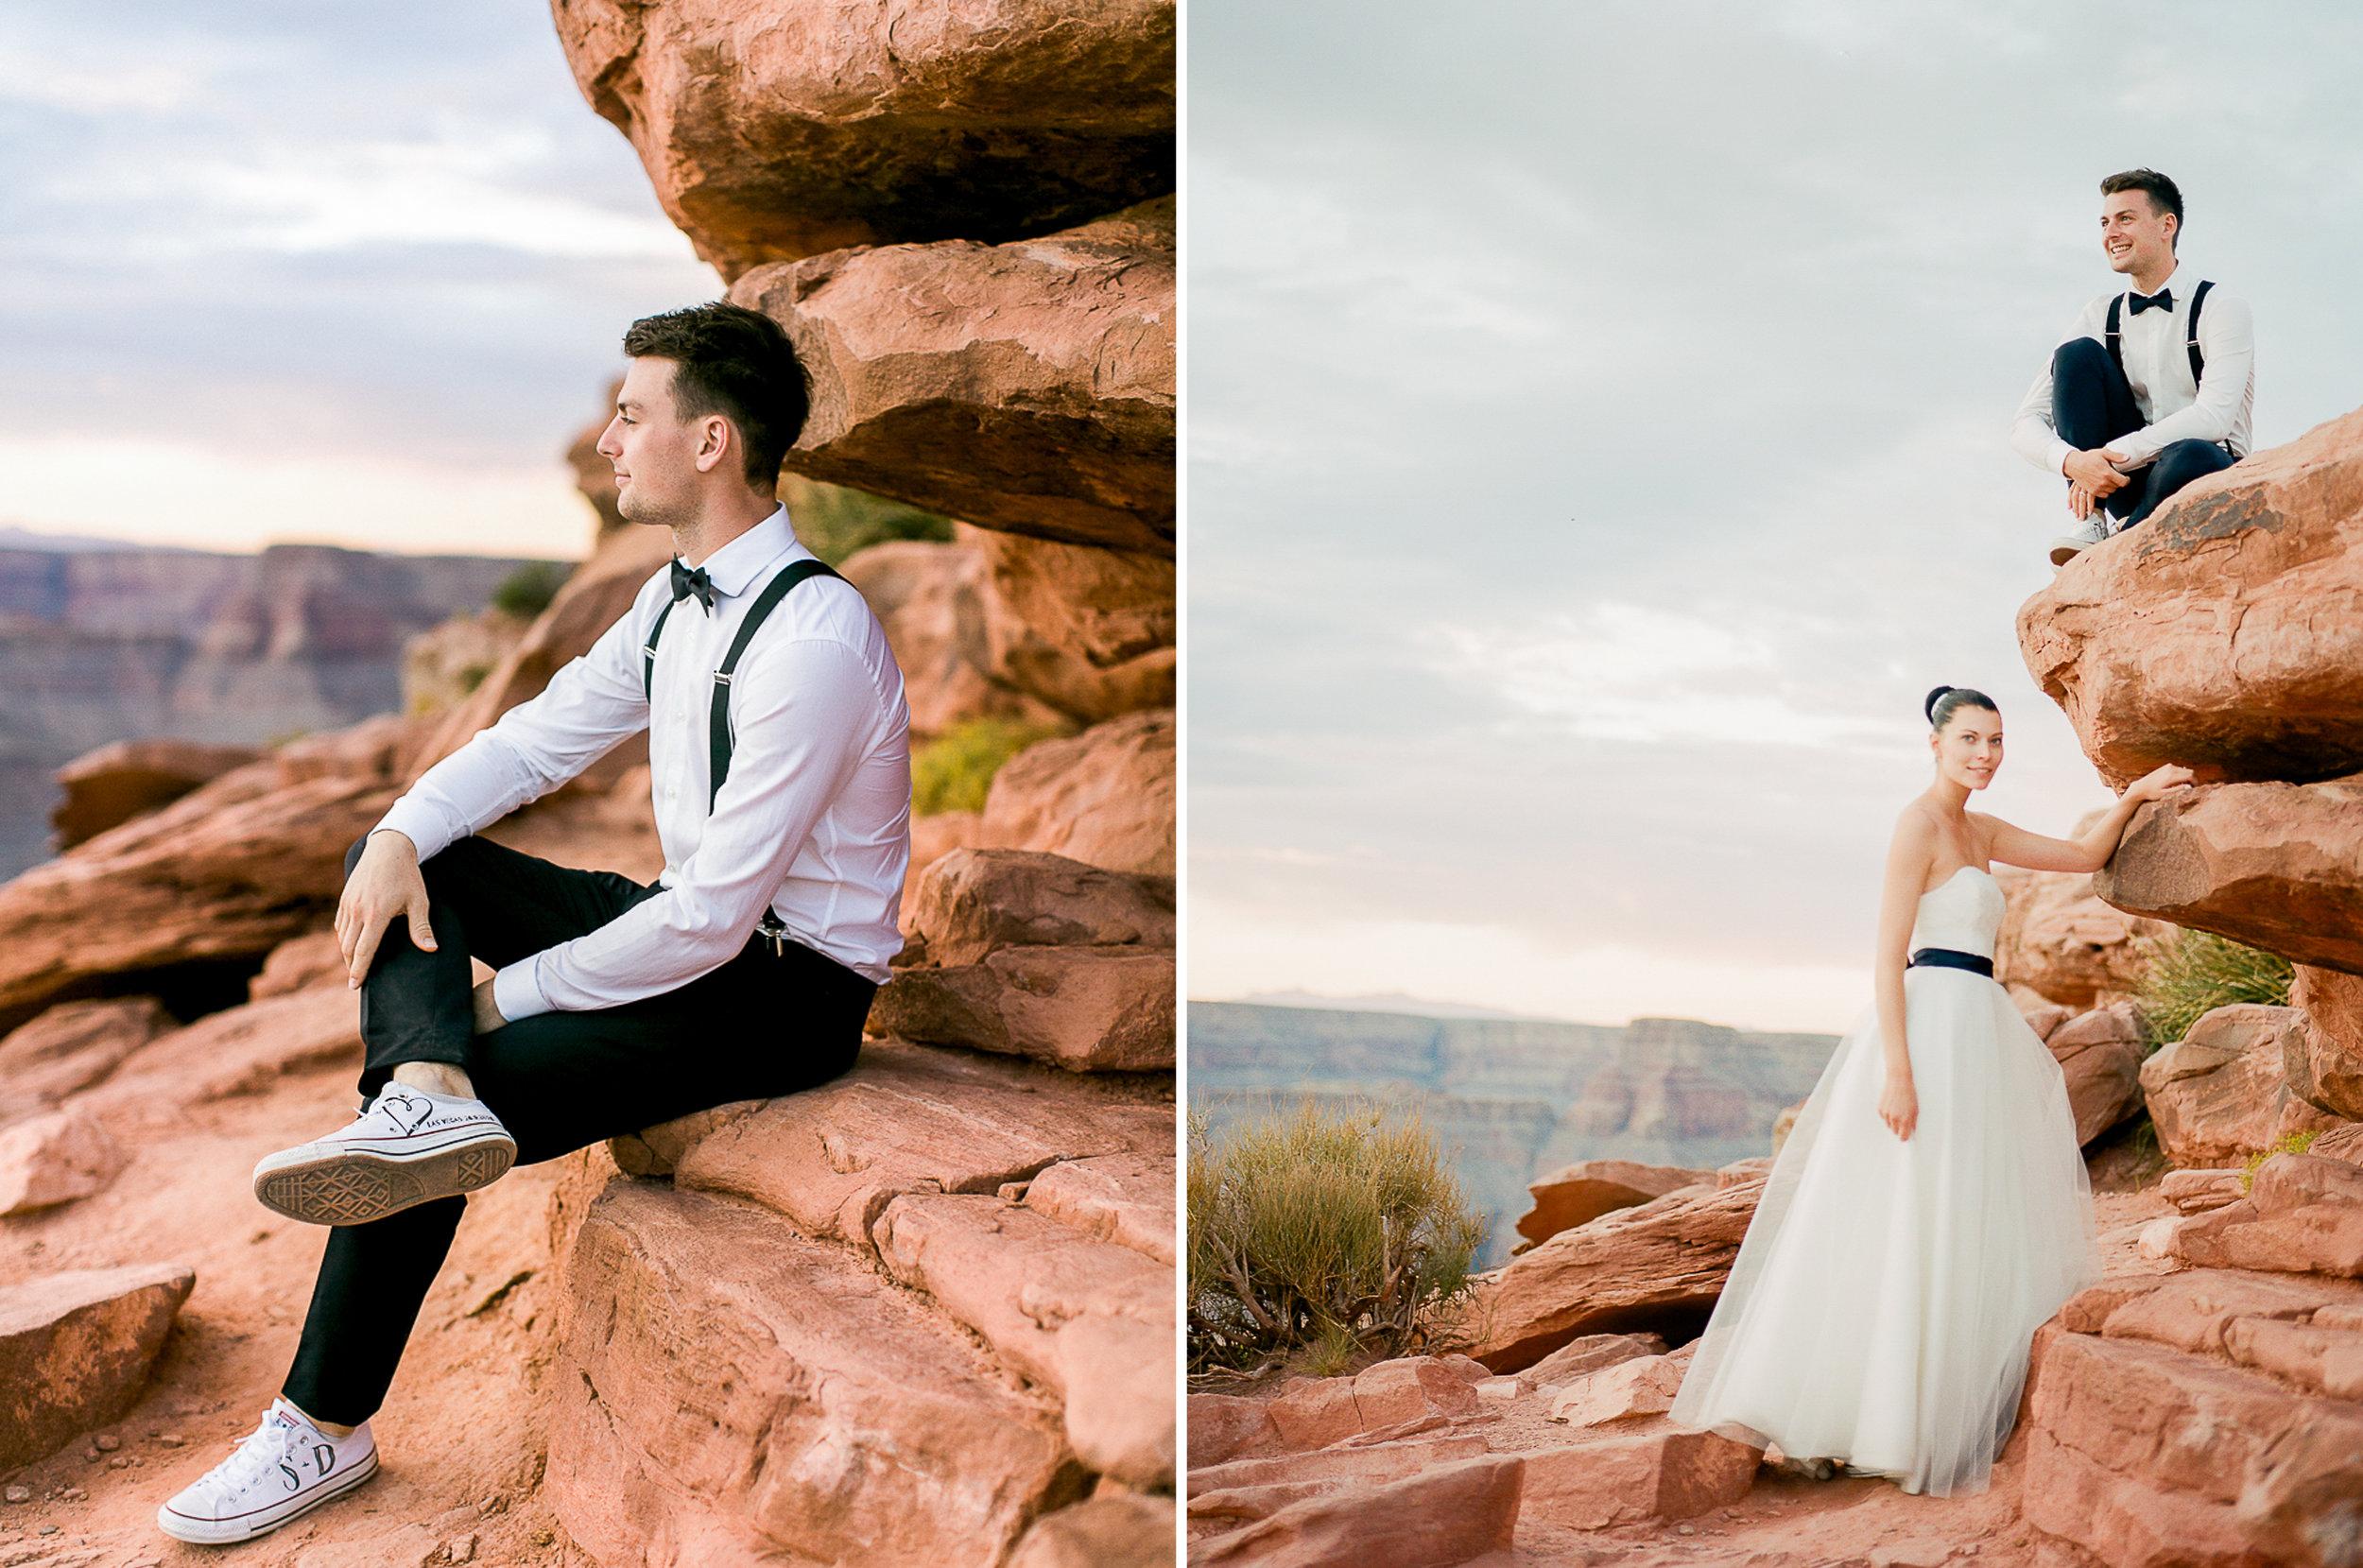 Susi-und-Danu-Hochzeit-Theresa-Pewal-Fotografie-fine-art-7-4.jpg